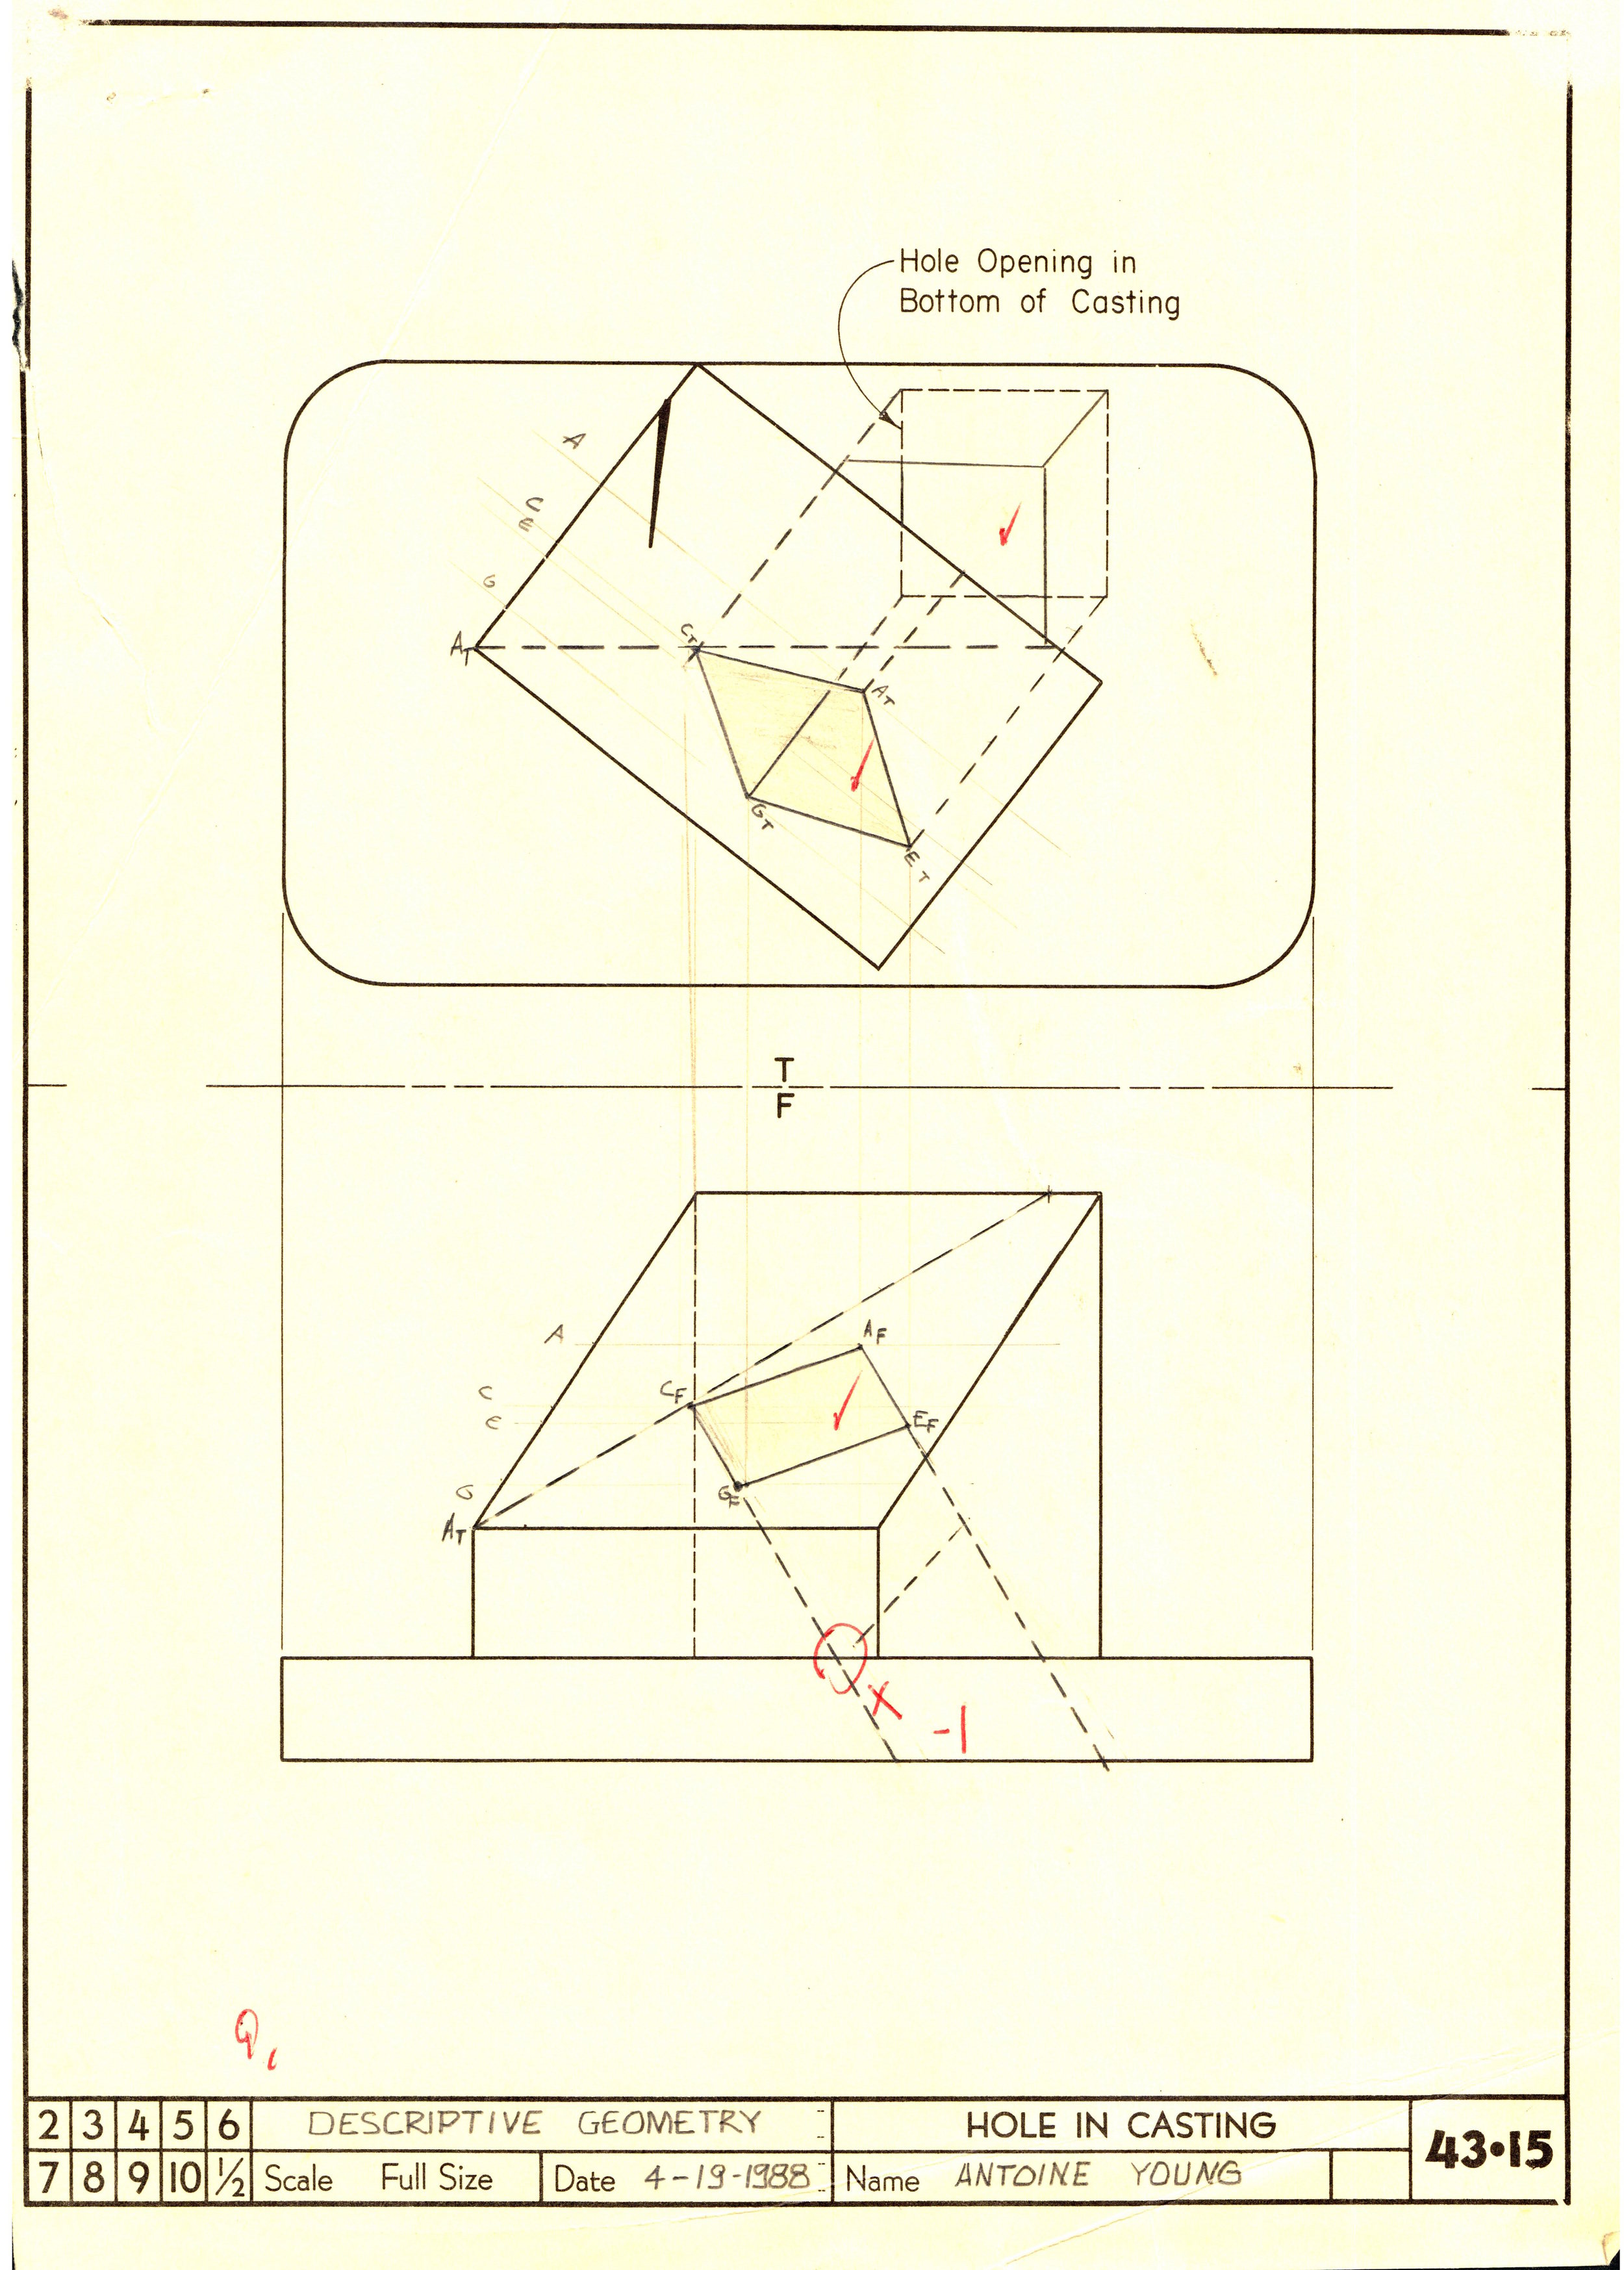 Geometric Tolerance & Dimensioning 2